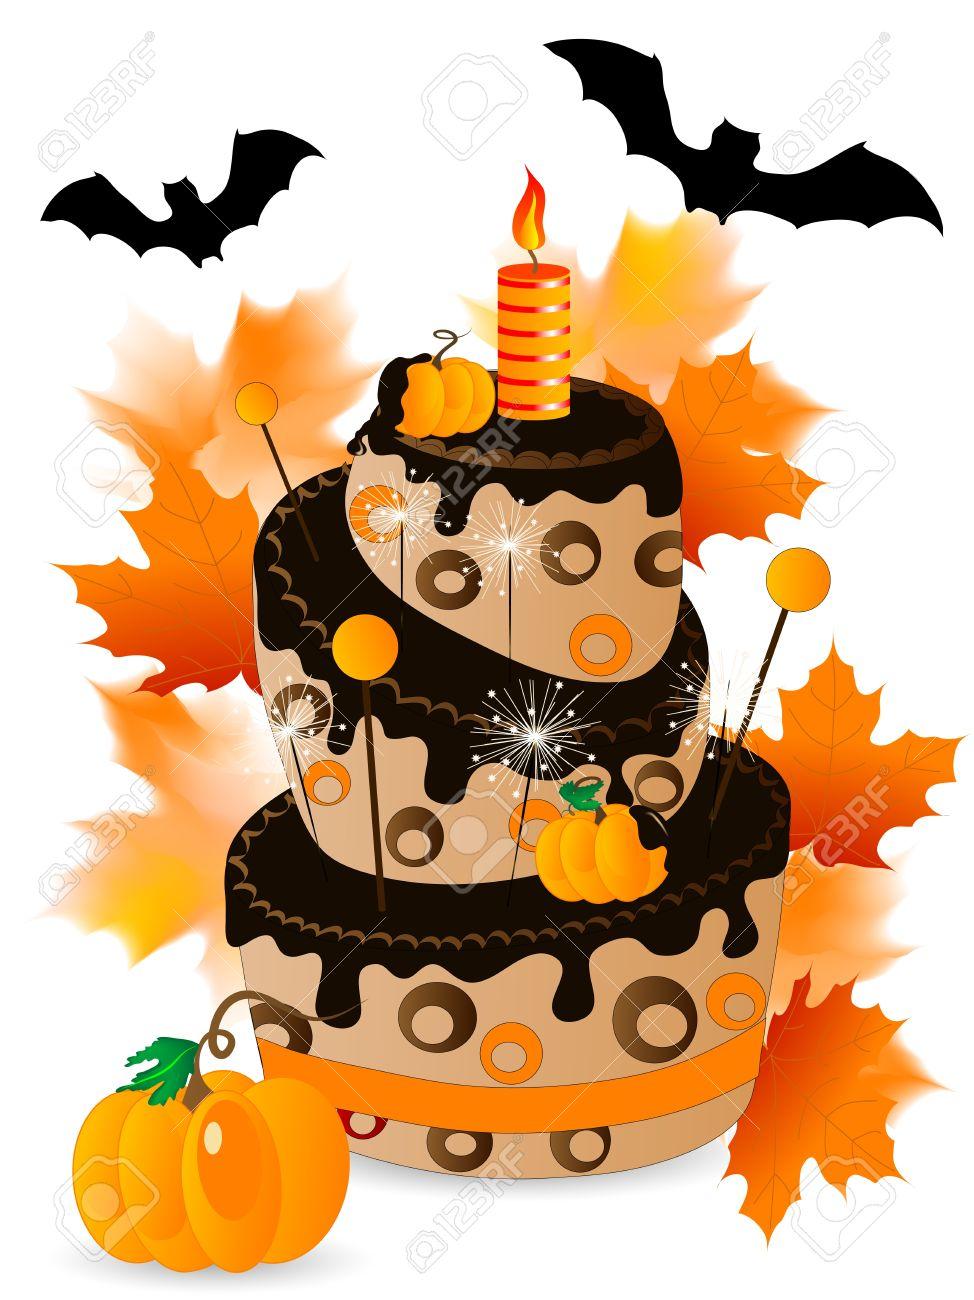 Halloween birthday cake clipart banner free stock Halloween birthday cake clipart - ClipartFest banner free stock